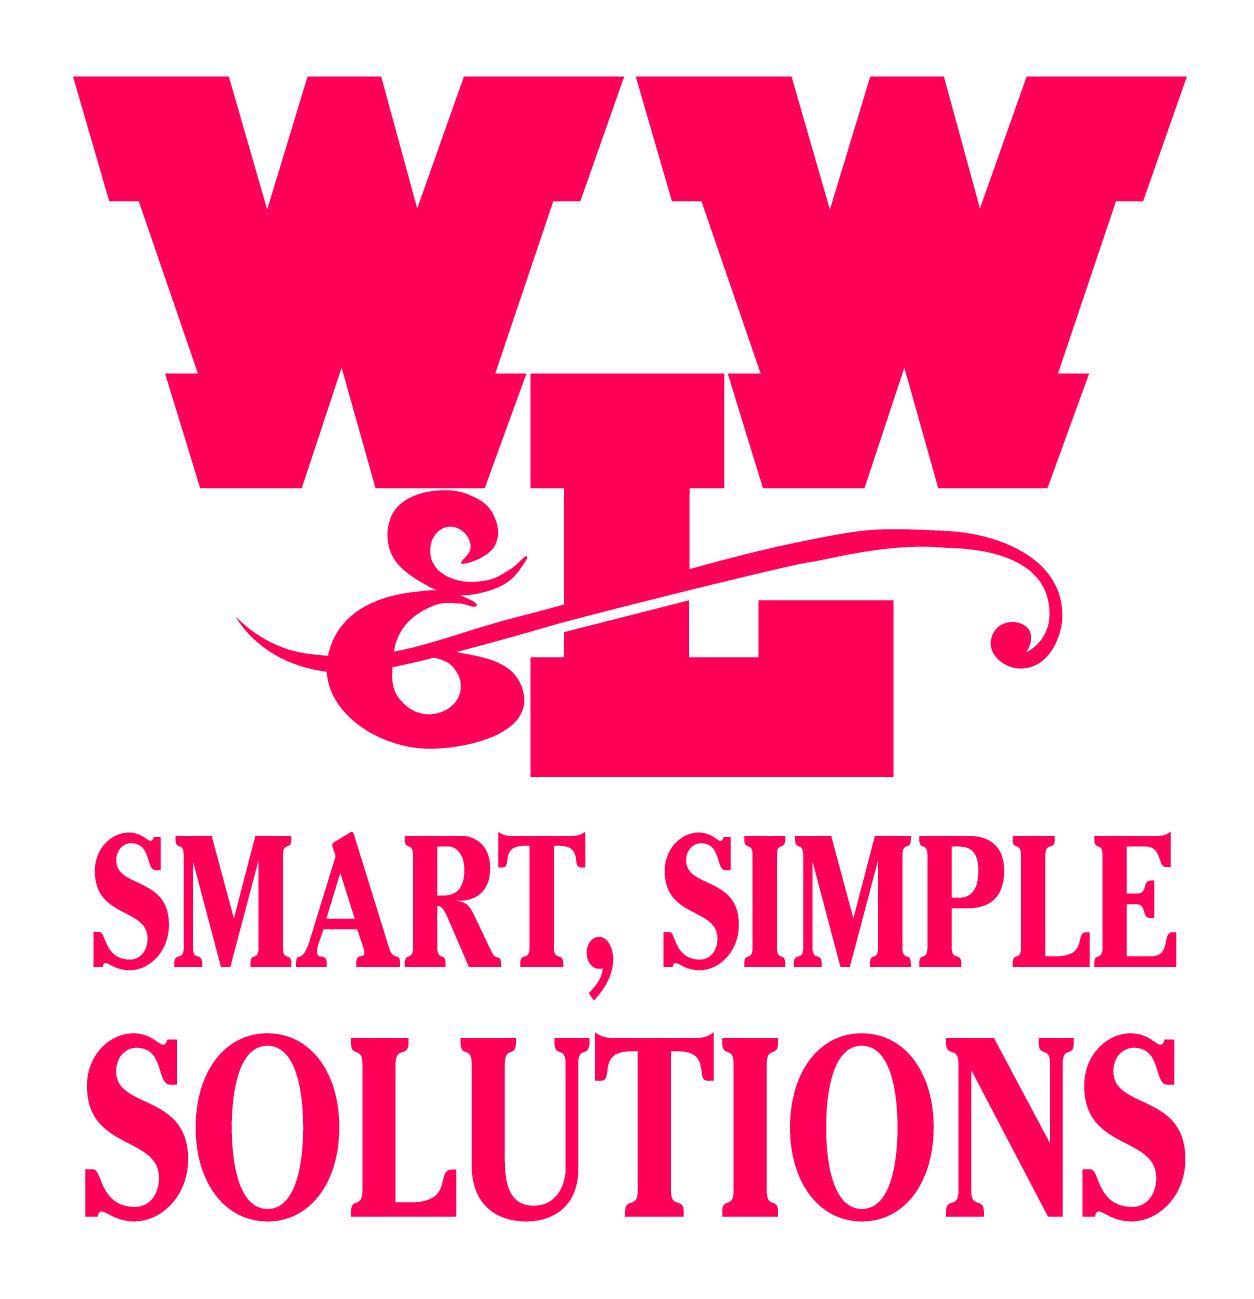 376299_WWL_SSS.jpg